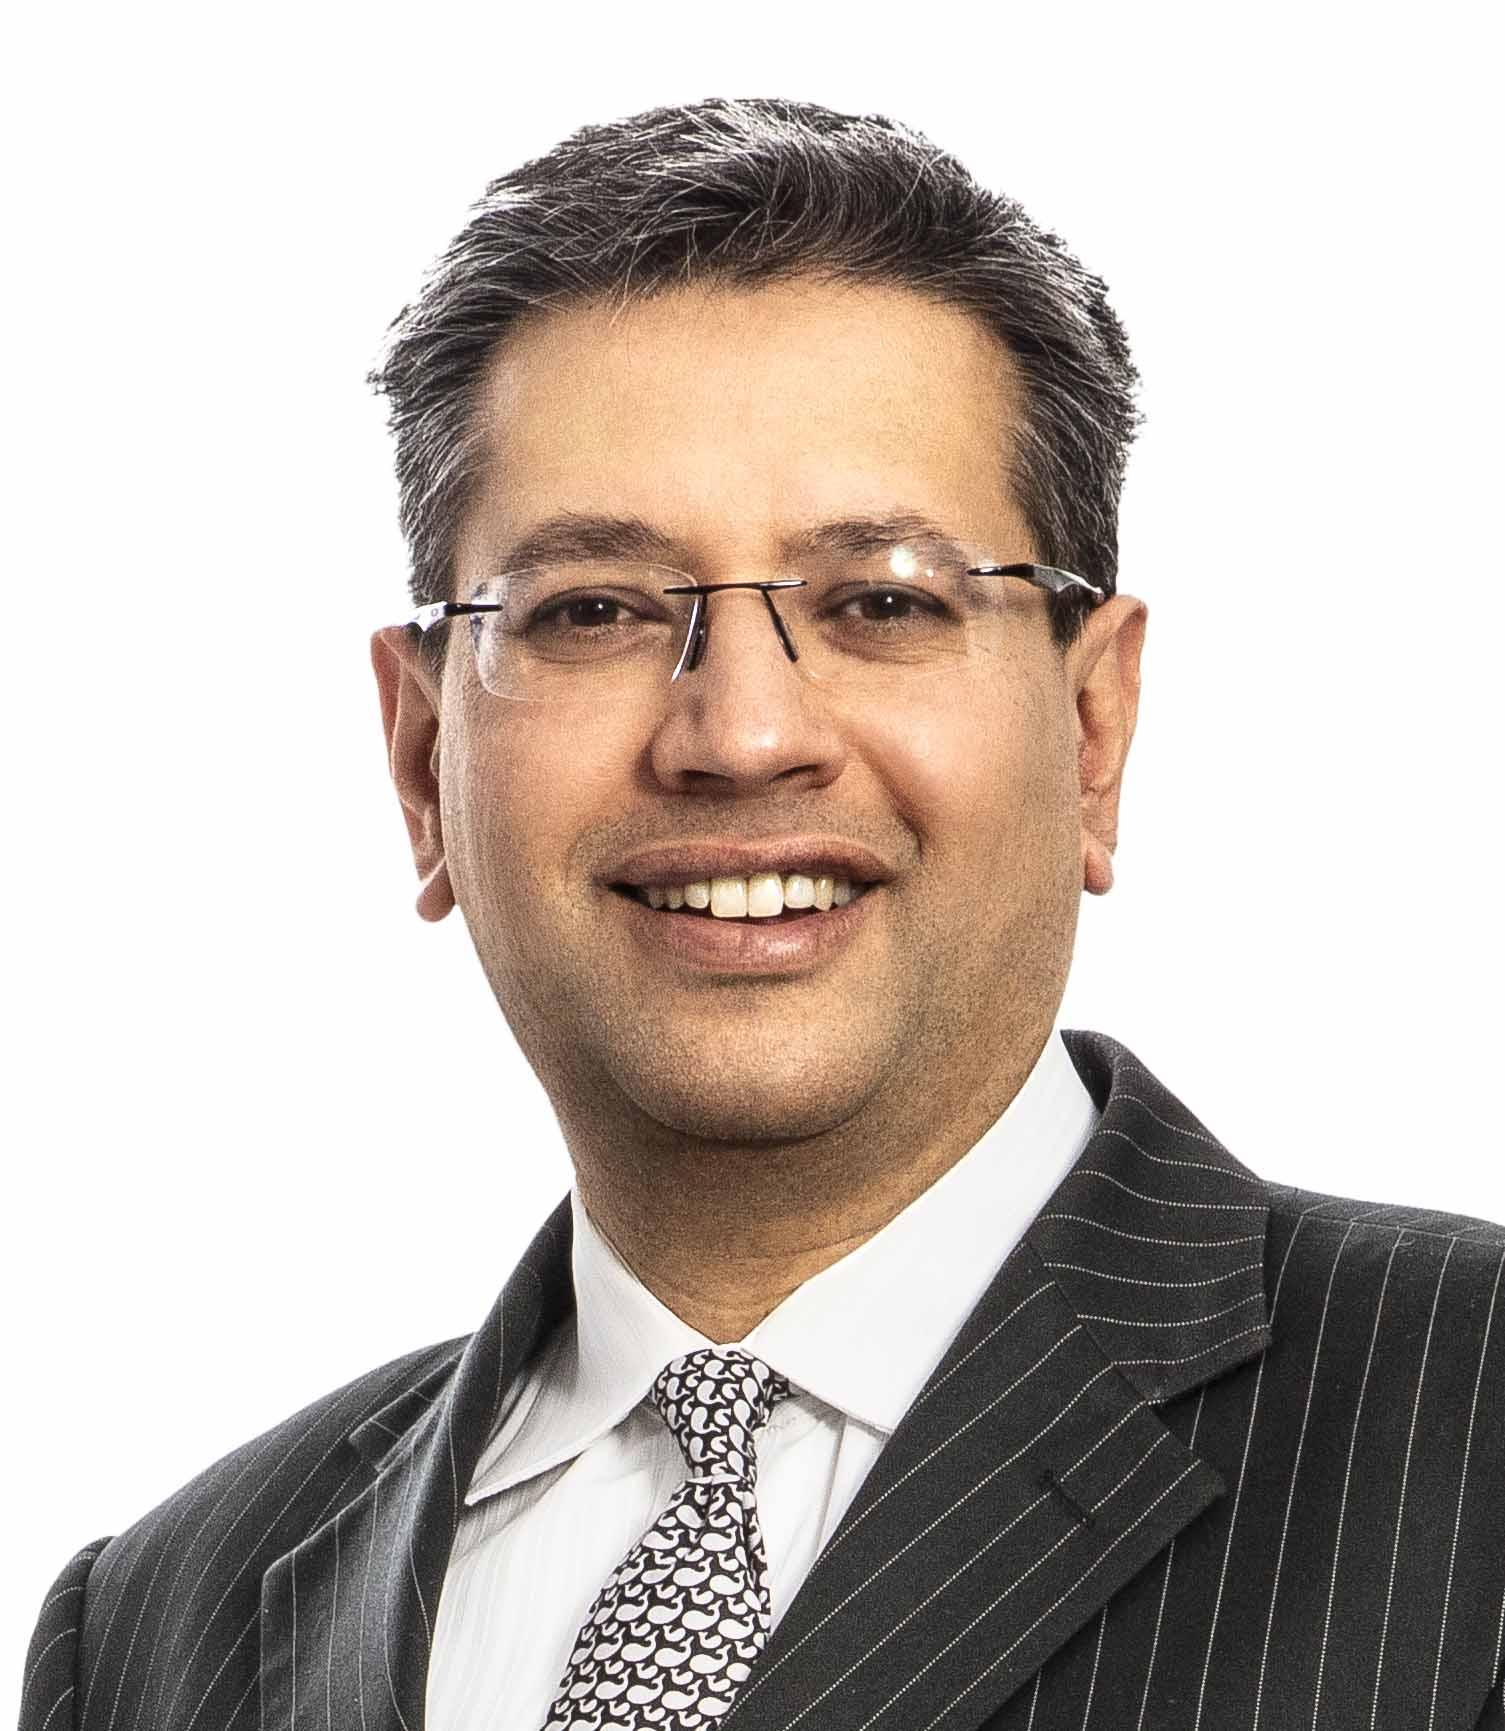 Rohit Verma, Crawford & Company (US)